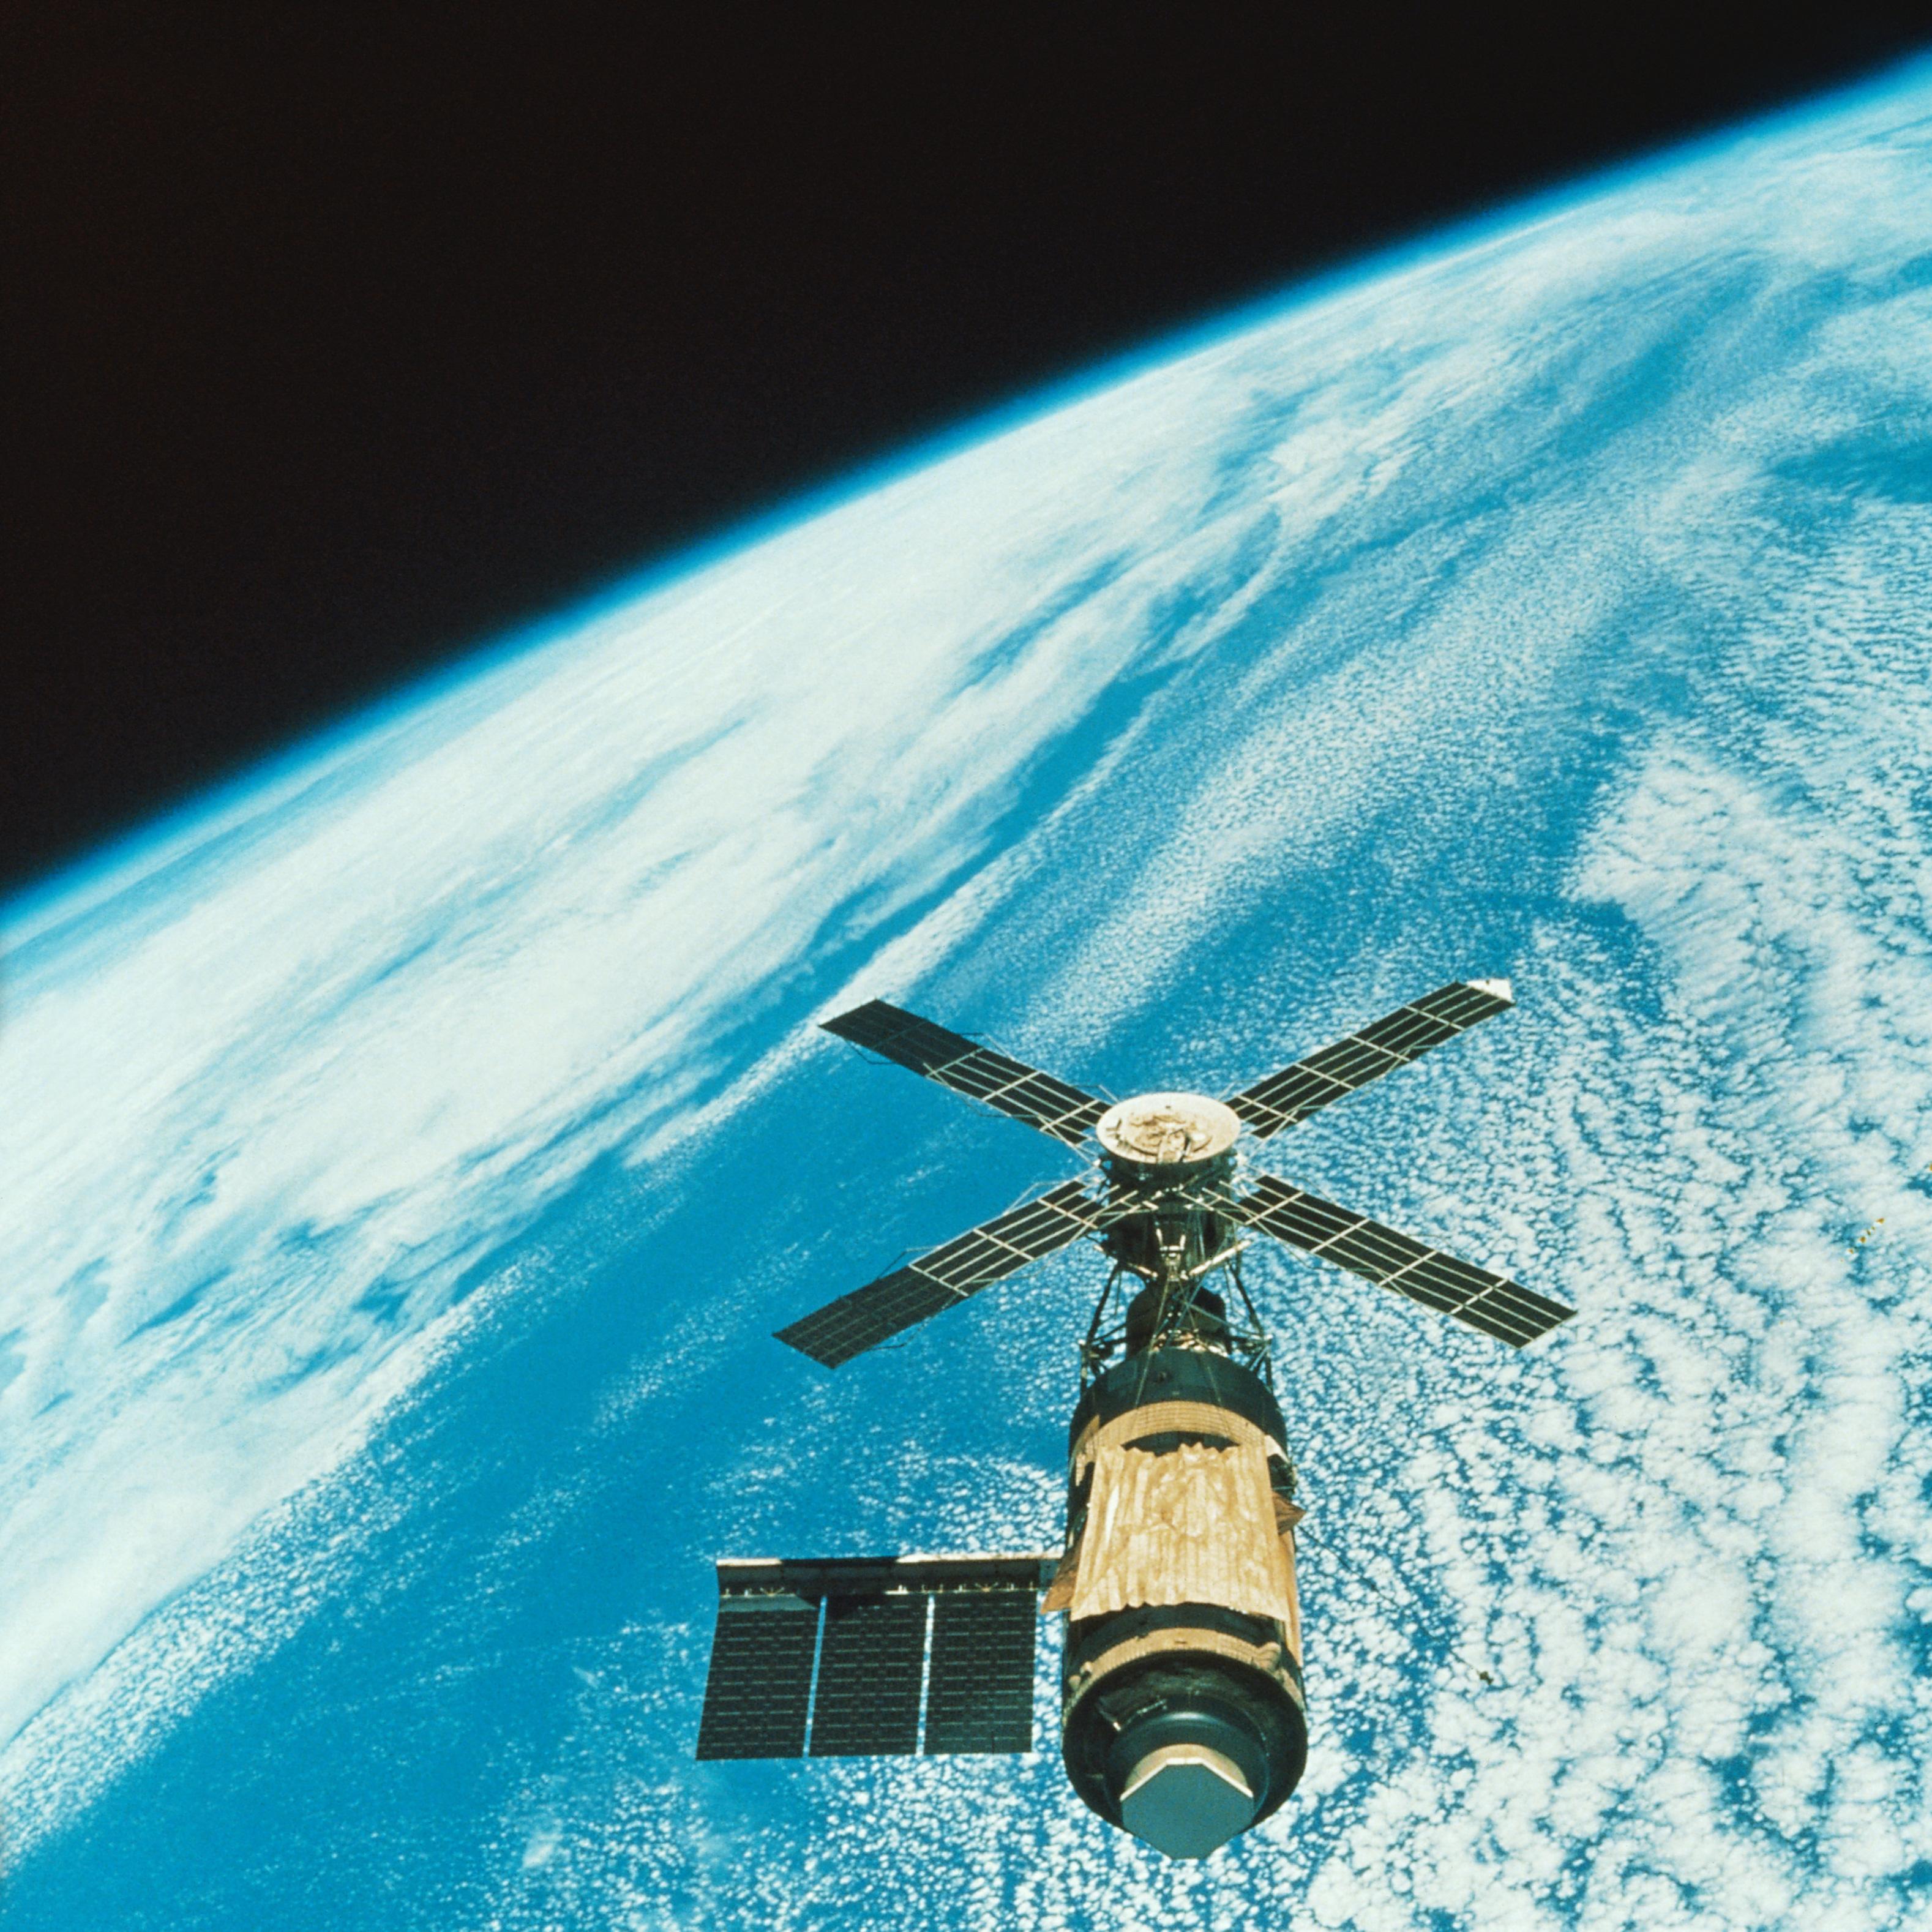 Skylab over Earth